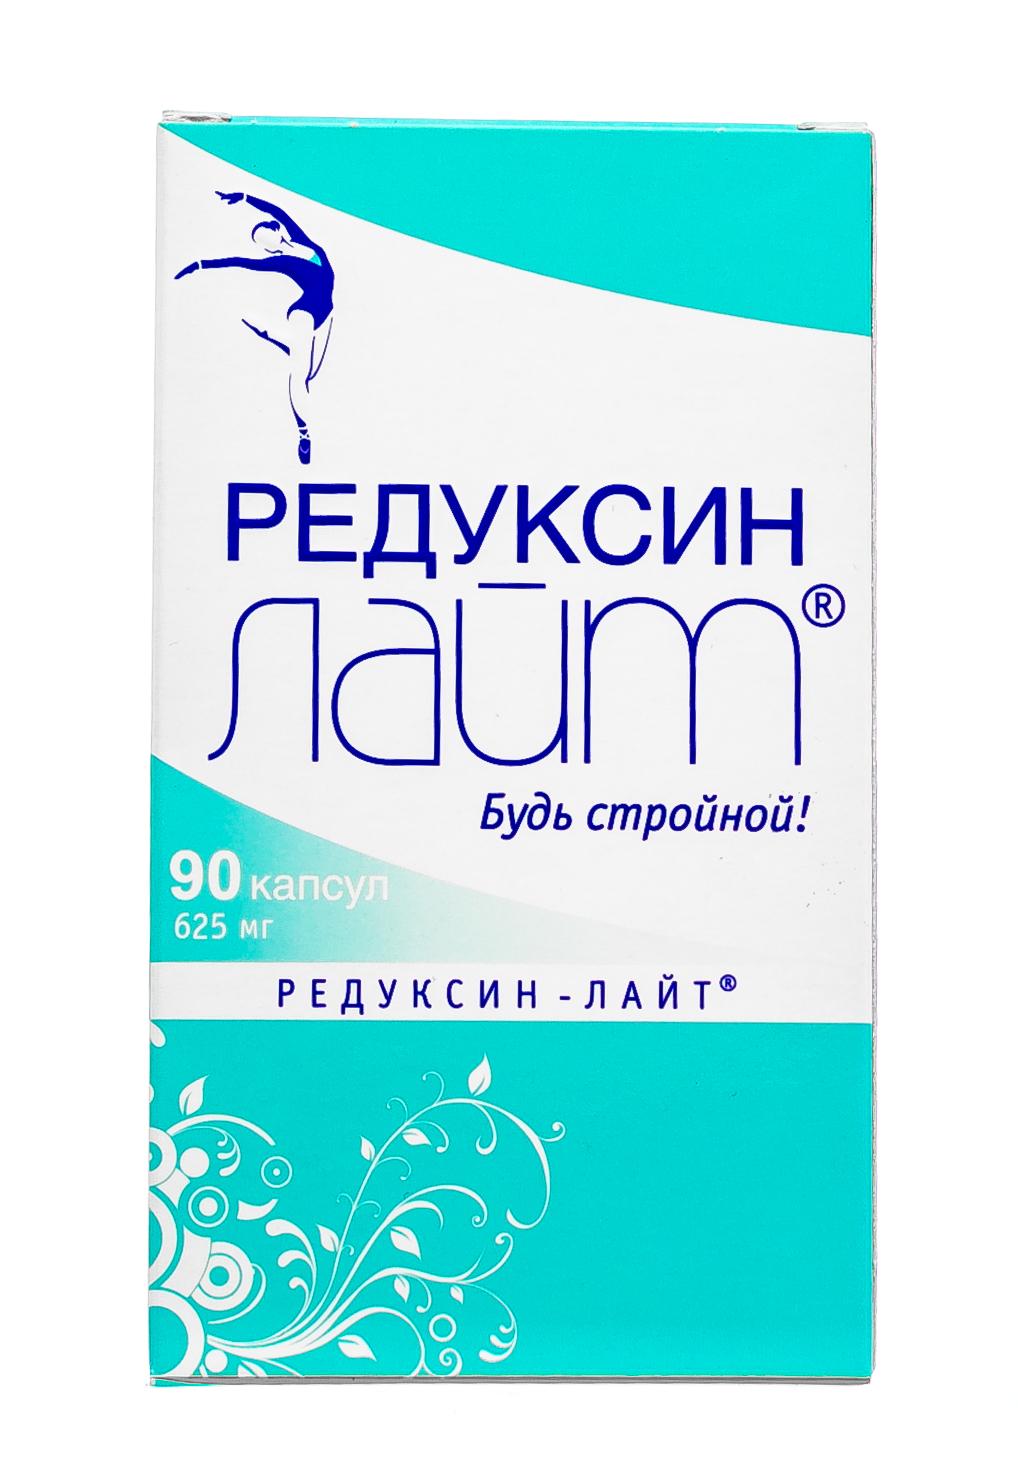 Редуксин-лайт Редуксин Лайт капсулы 625 мг, №90 (Редуксин-лайт, Витамины)